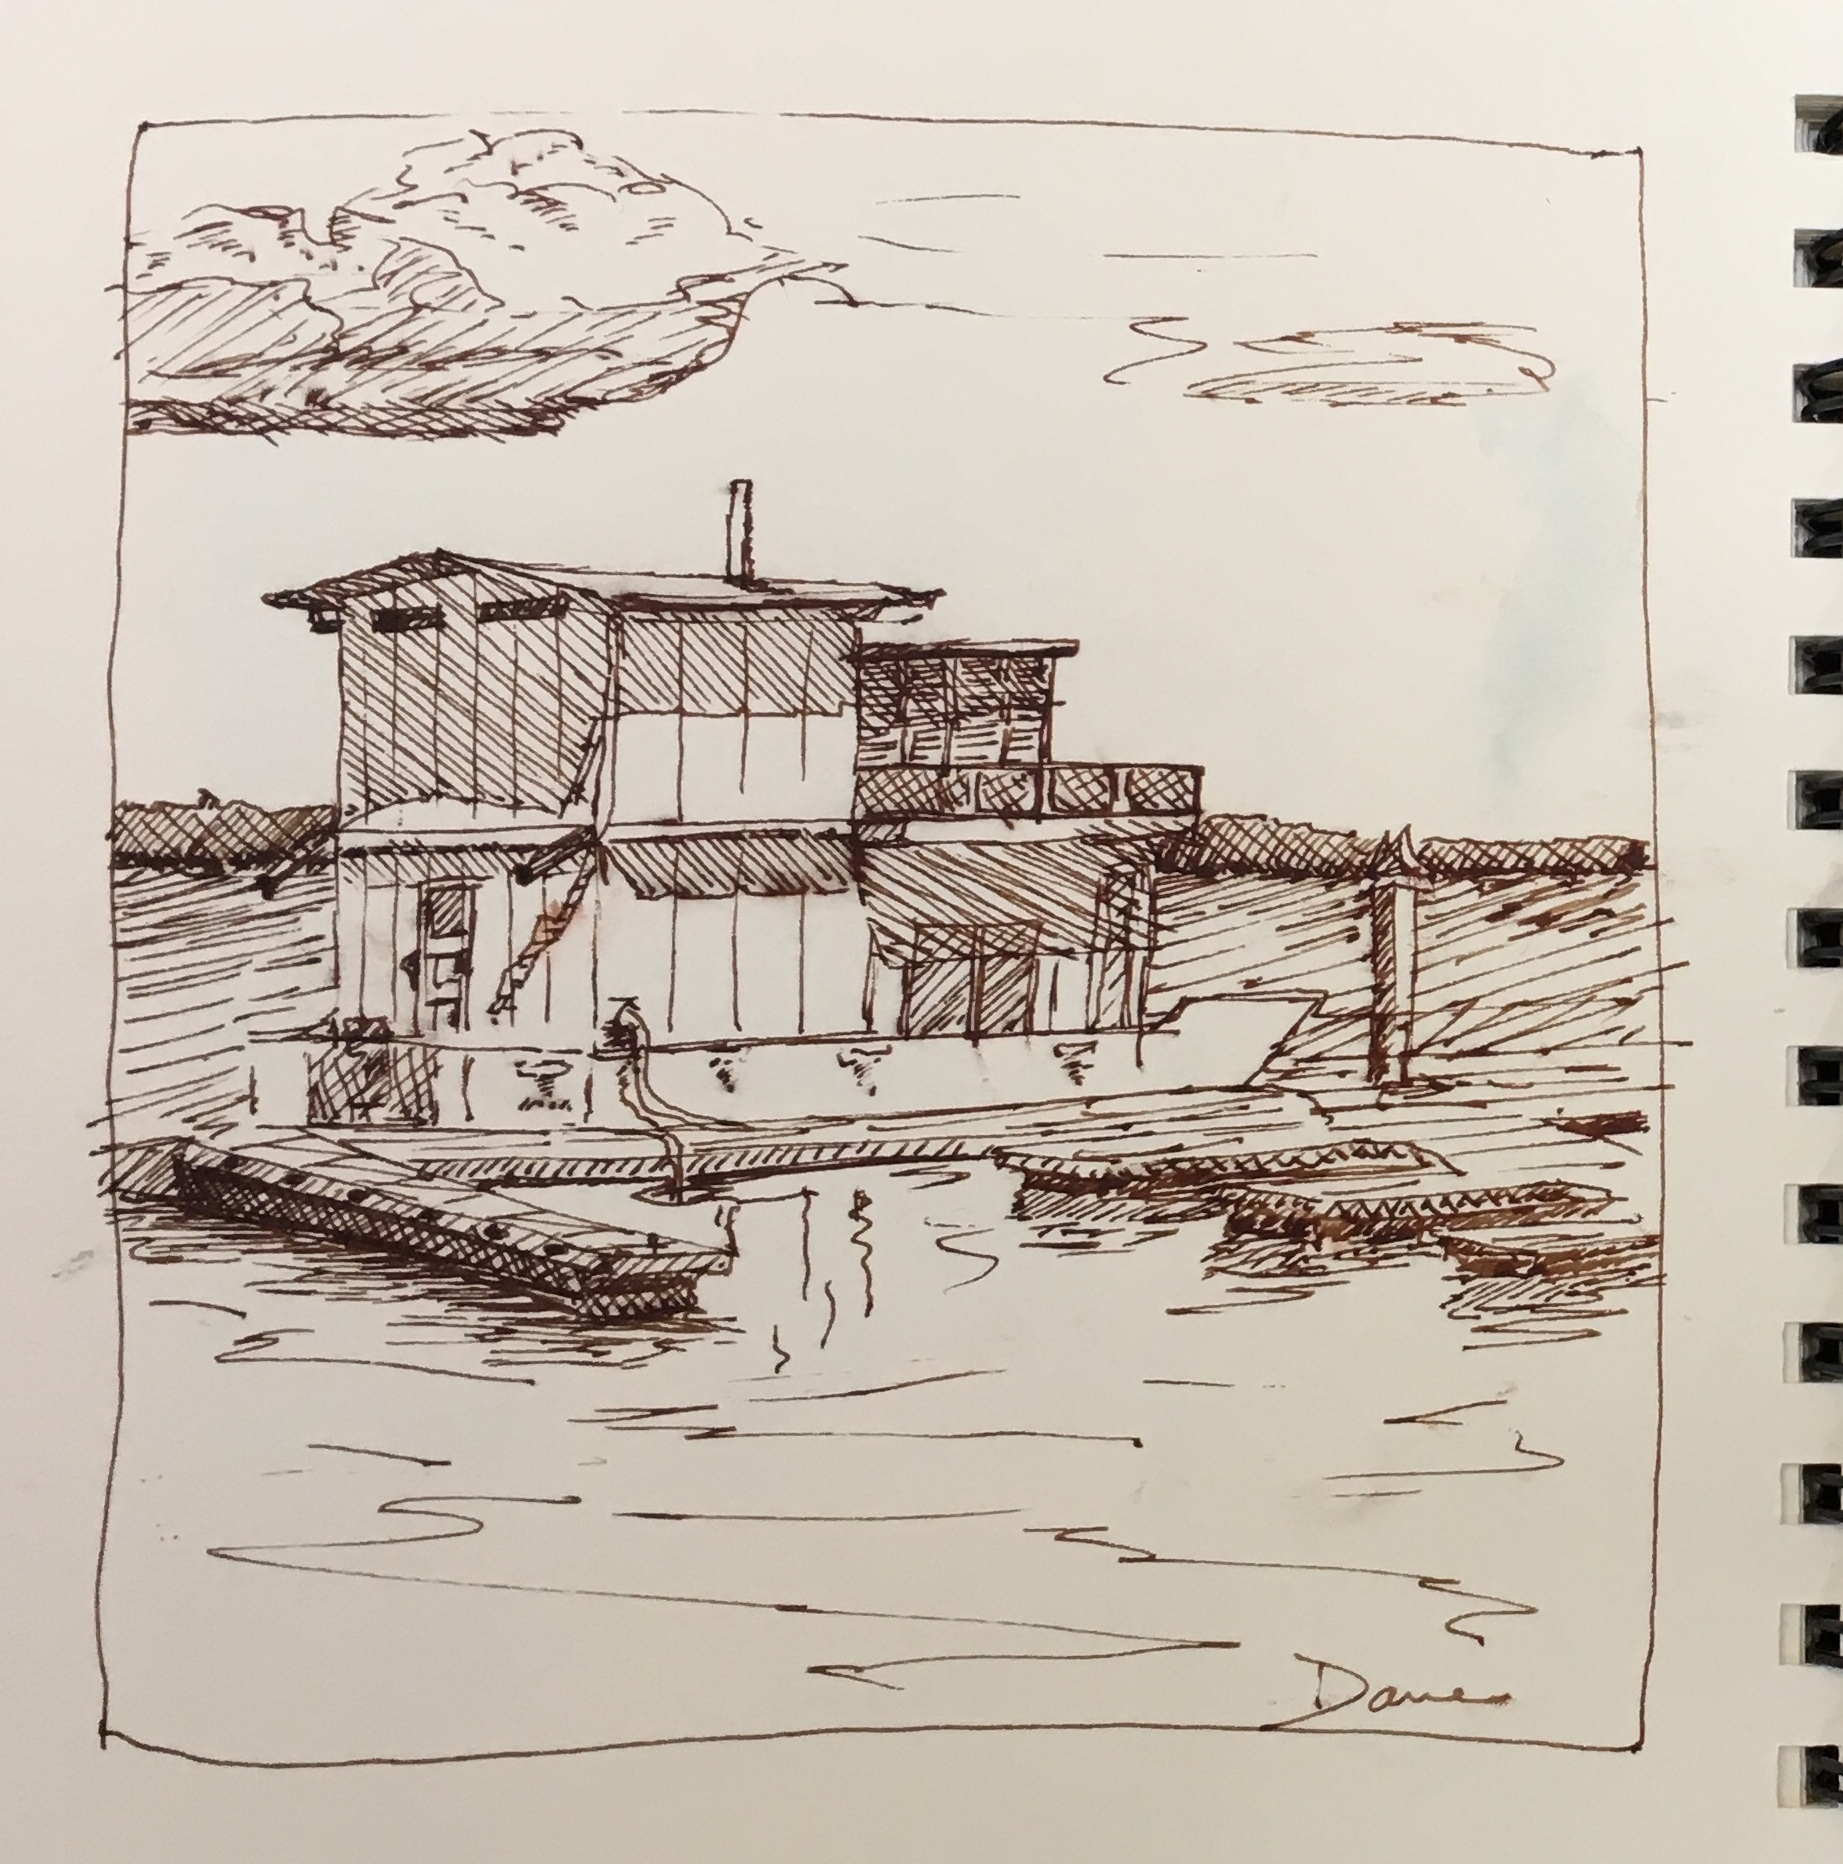 House Boat SF Bay